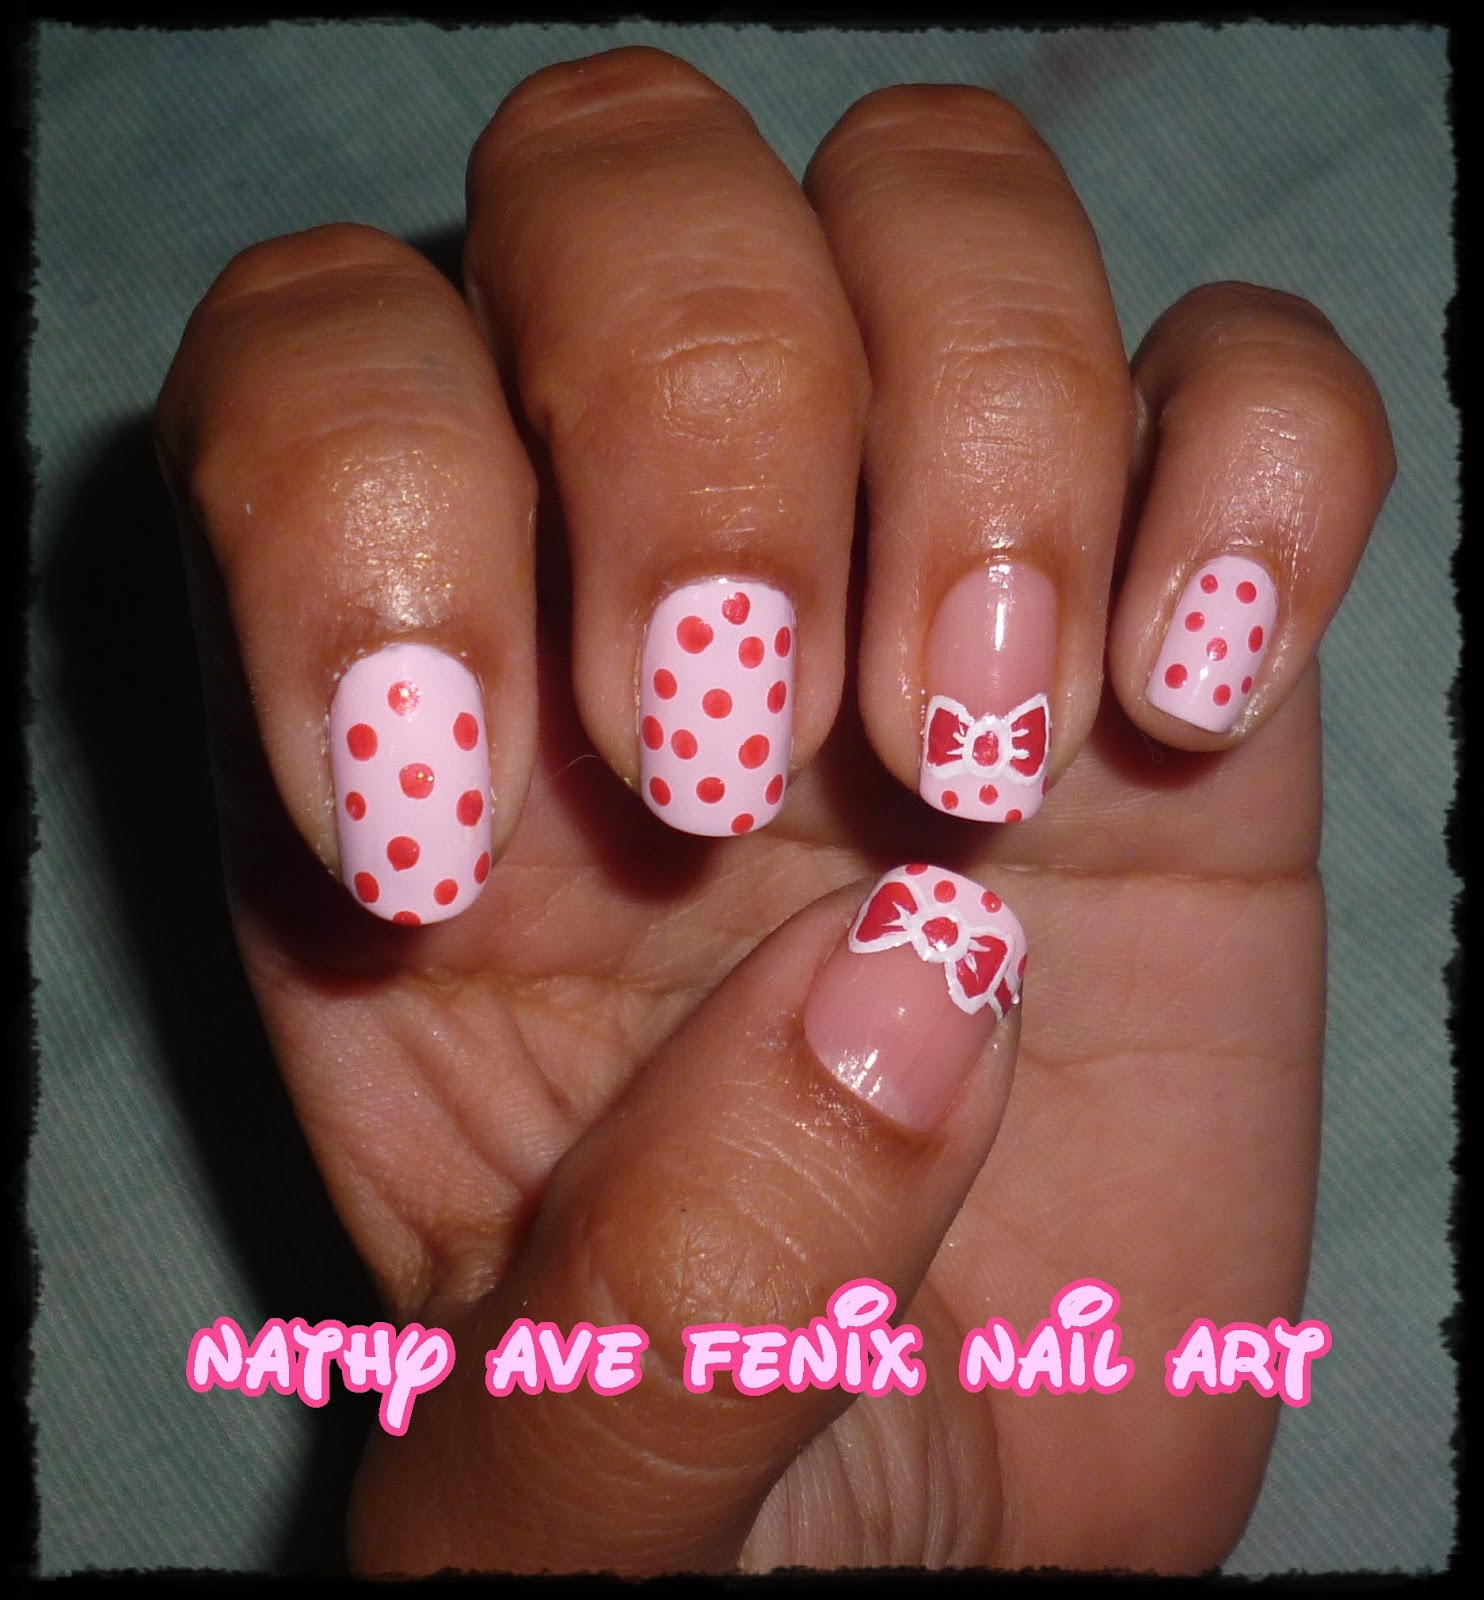 Nail Art Pik Avenue: NATHY AVE FENIX NAIL ART: DIA 14 DEL RETO: TONOS PASTEL